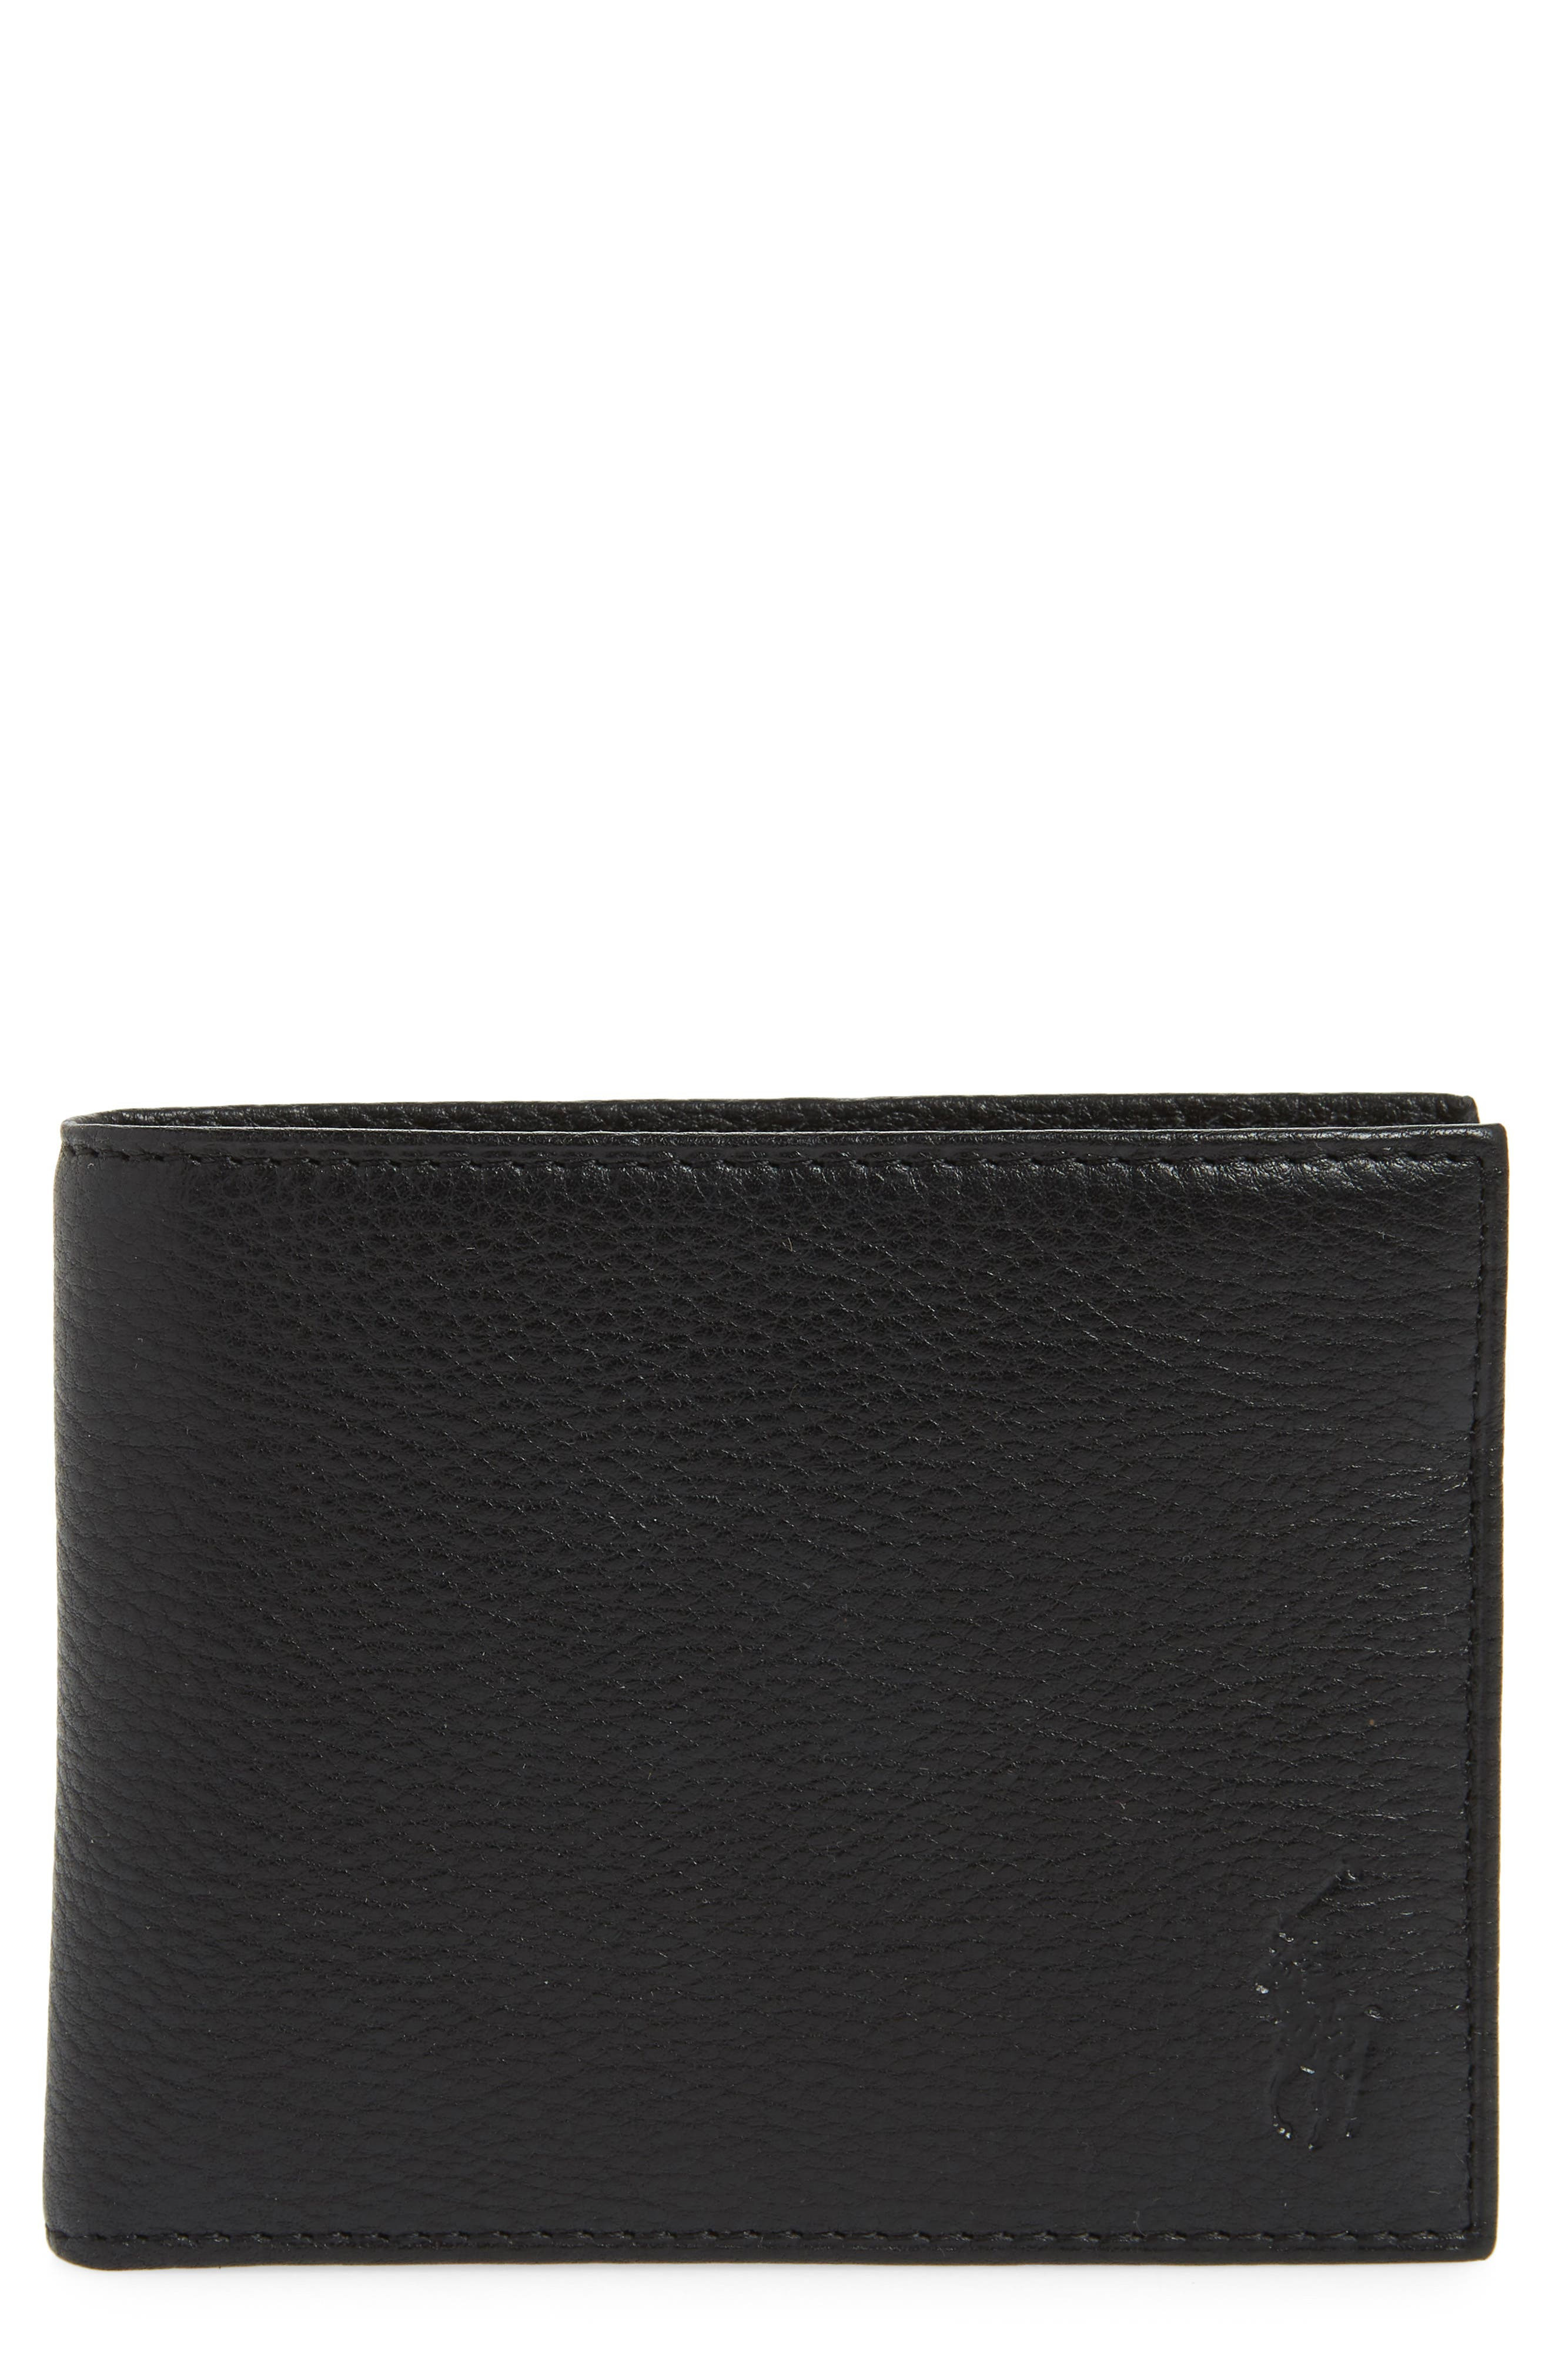 Polo Ralph Lauren Leather Passcase Wallet